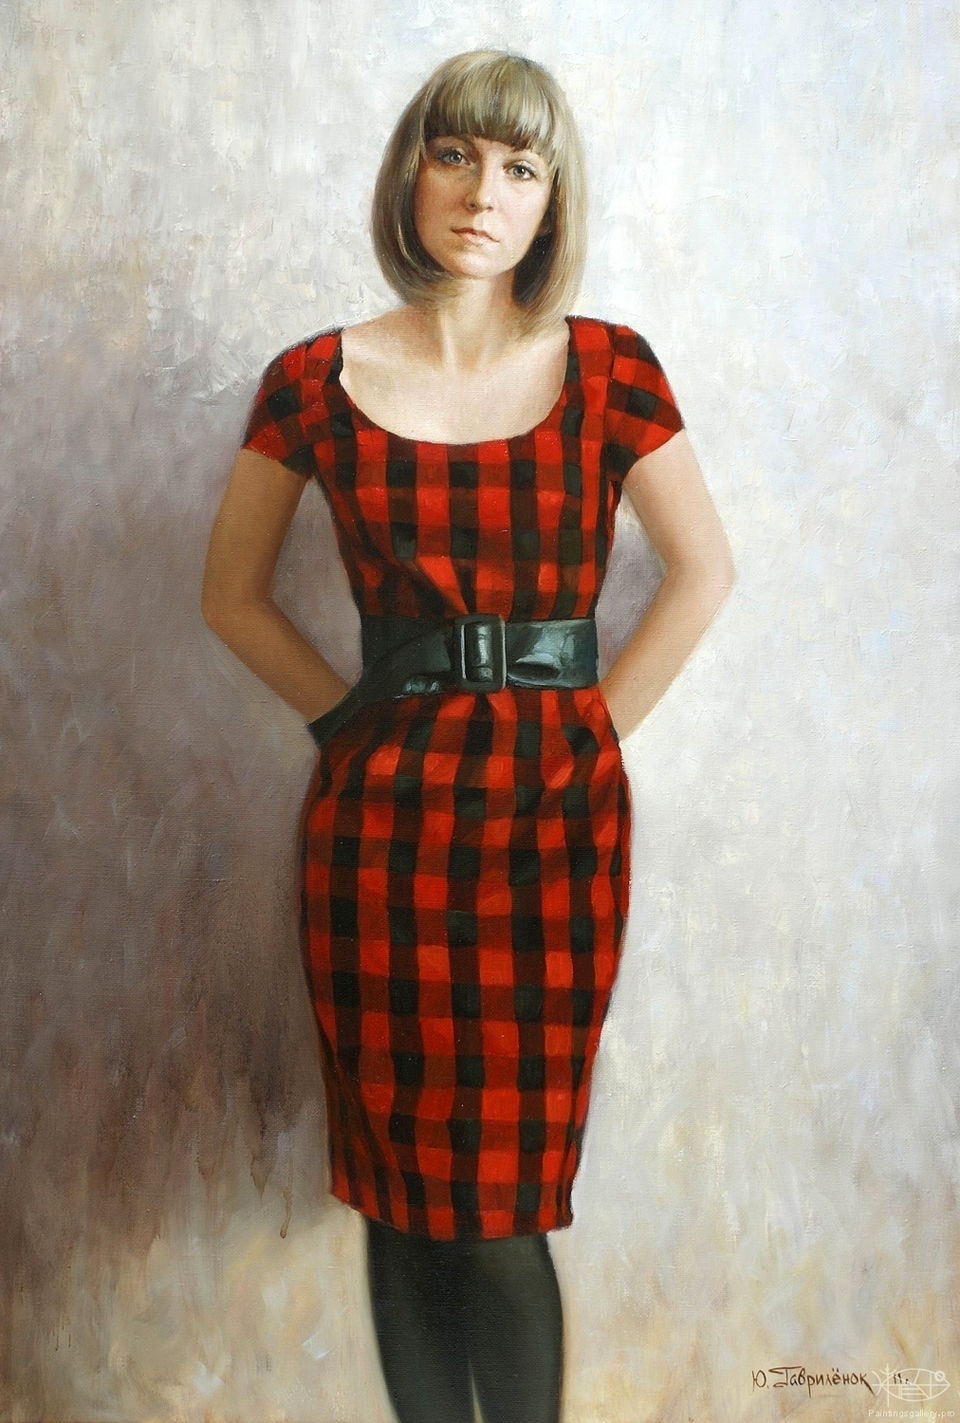 www.PaintingsGallery.pro_Gavrilenok_Yuriy_Anastasiya_large_222662.jpg